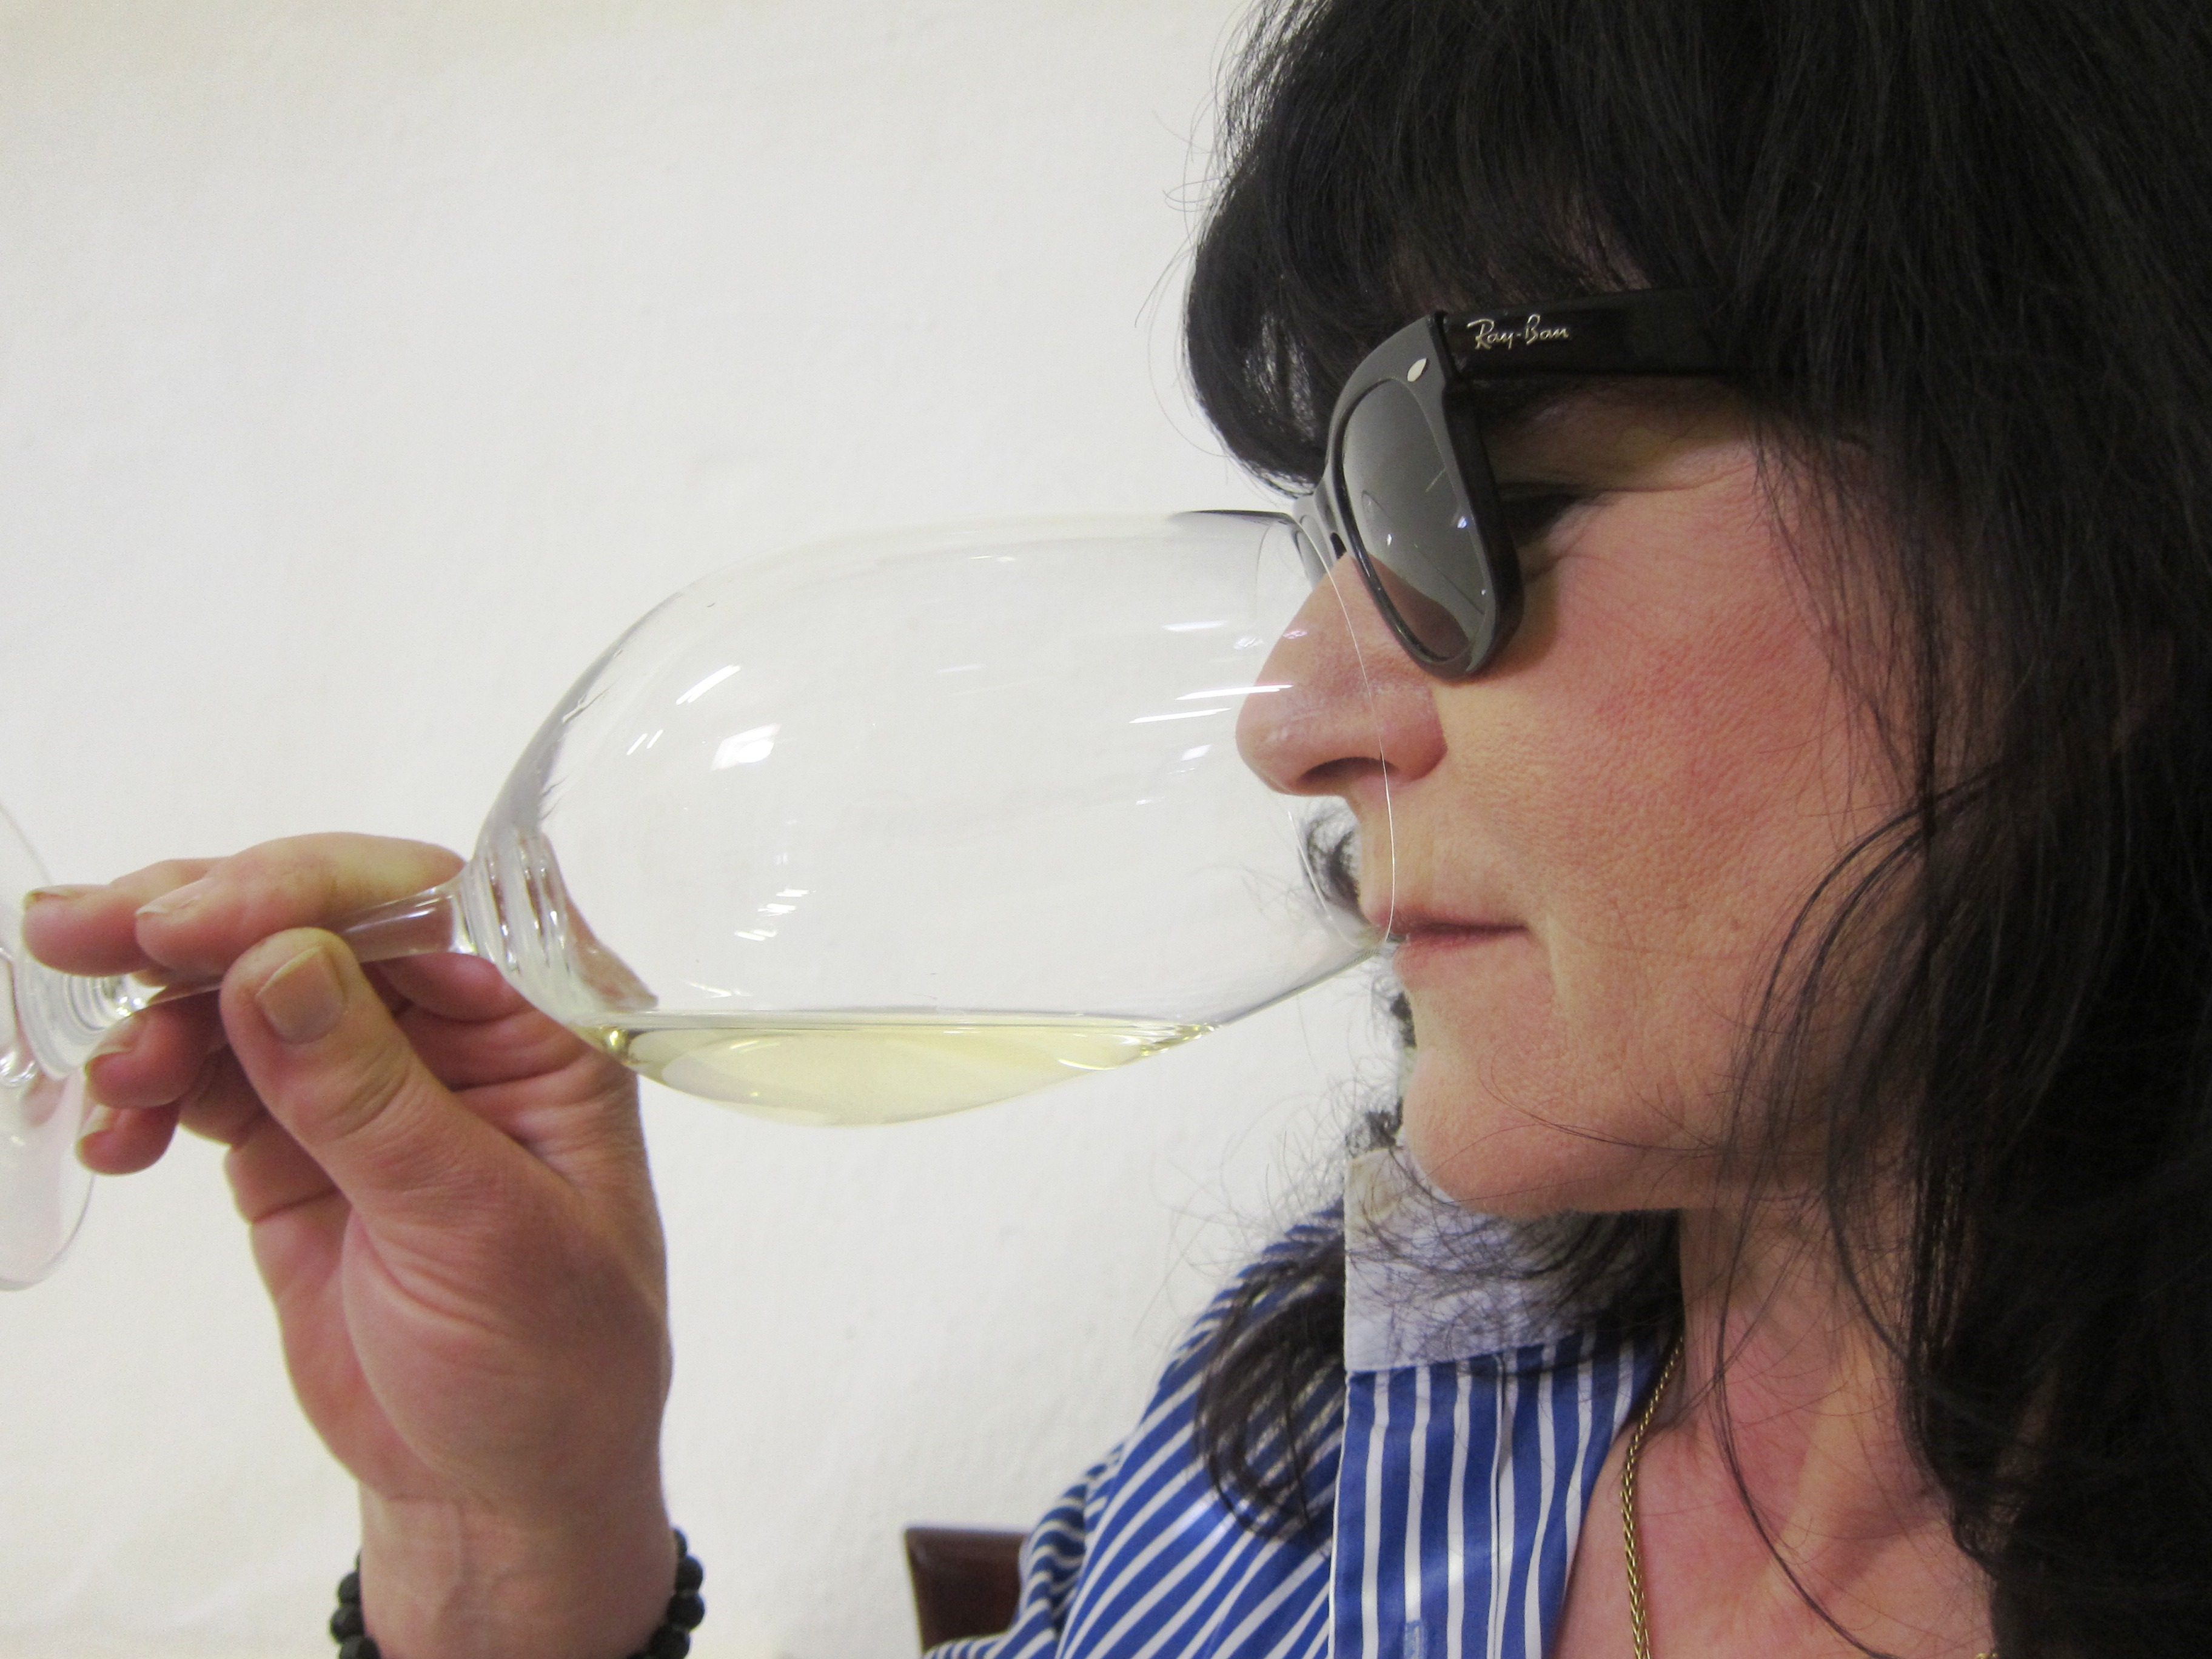 2010 valandraud st. emilion bordeaux wine